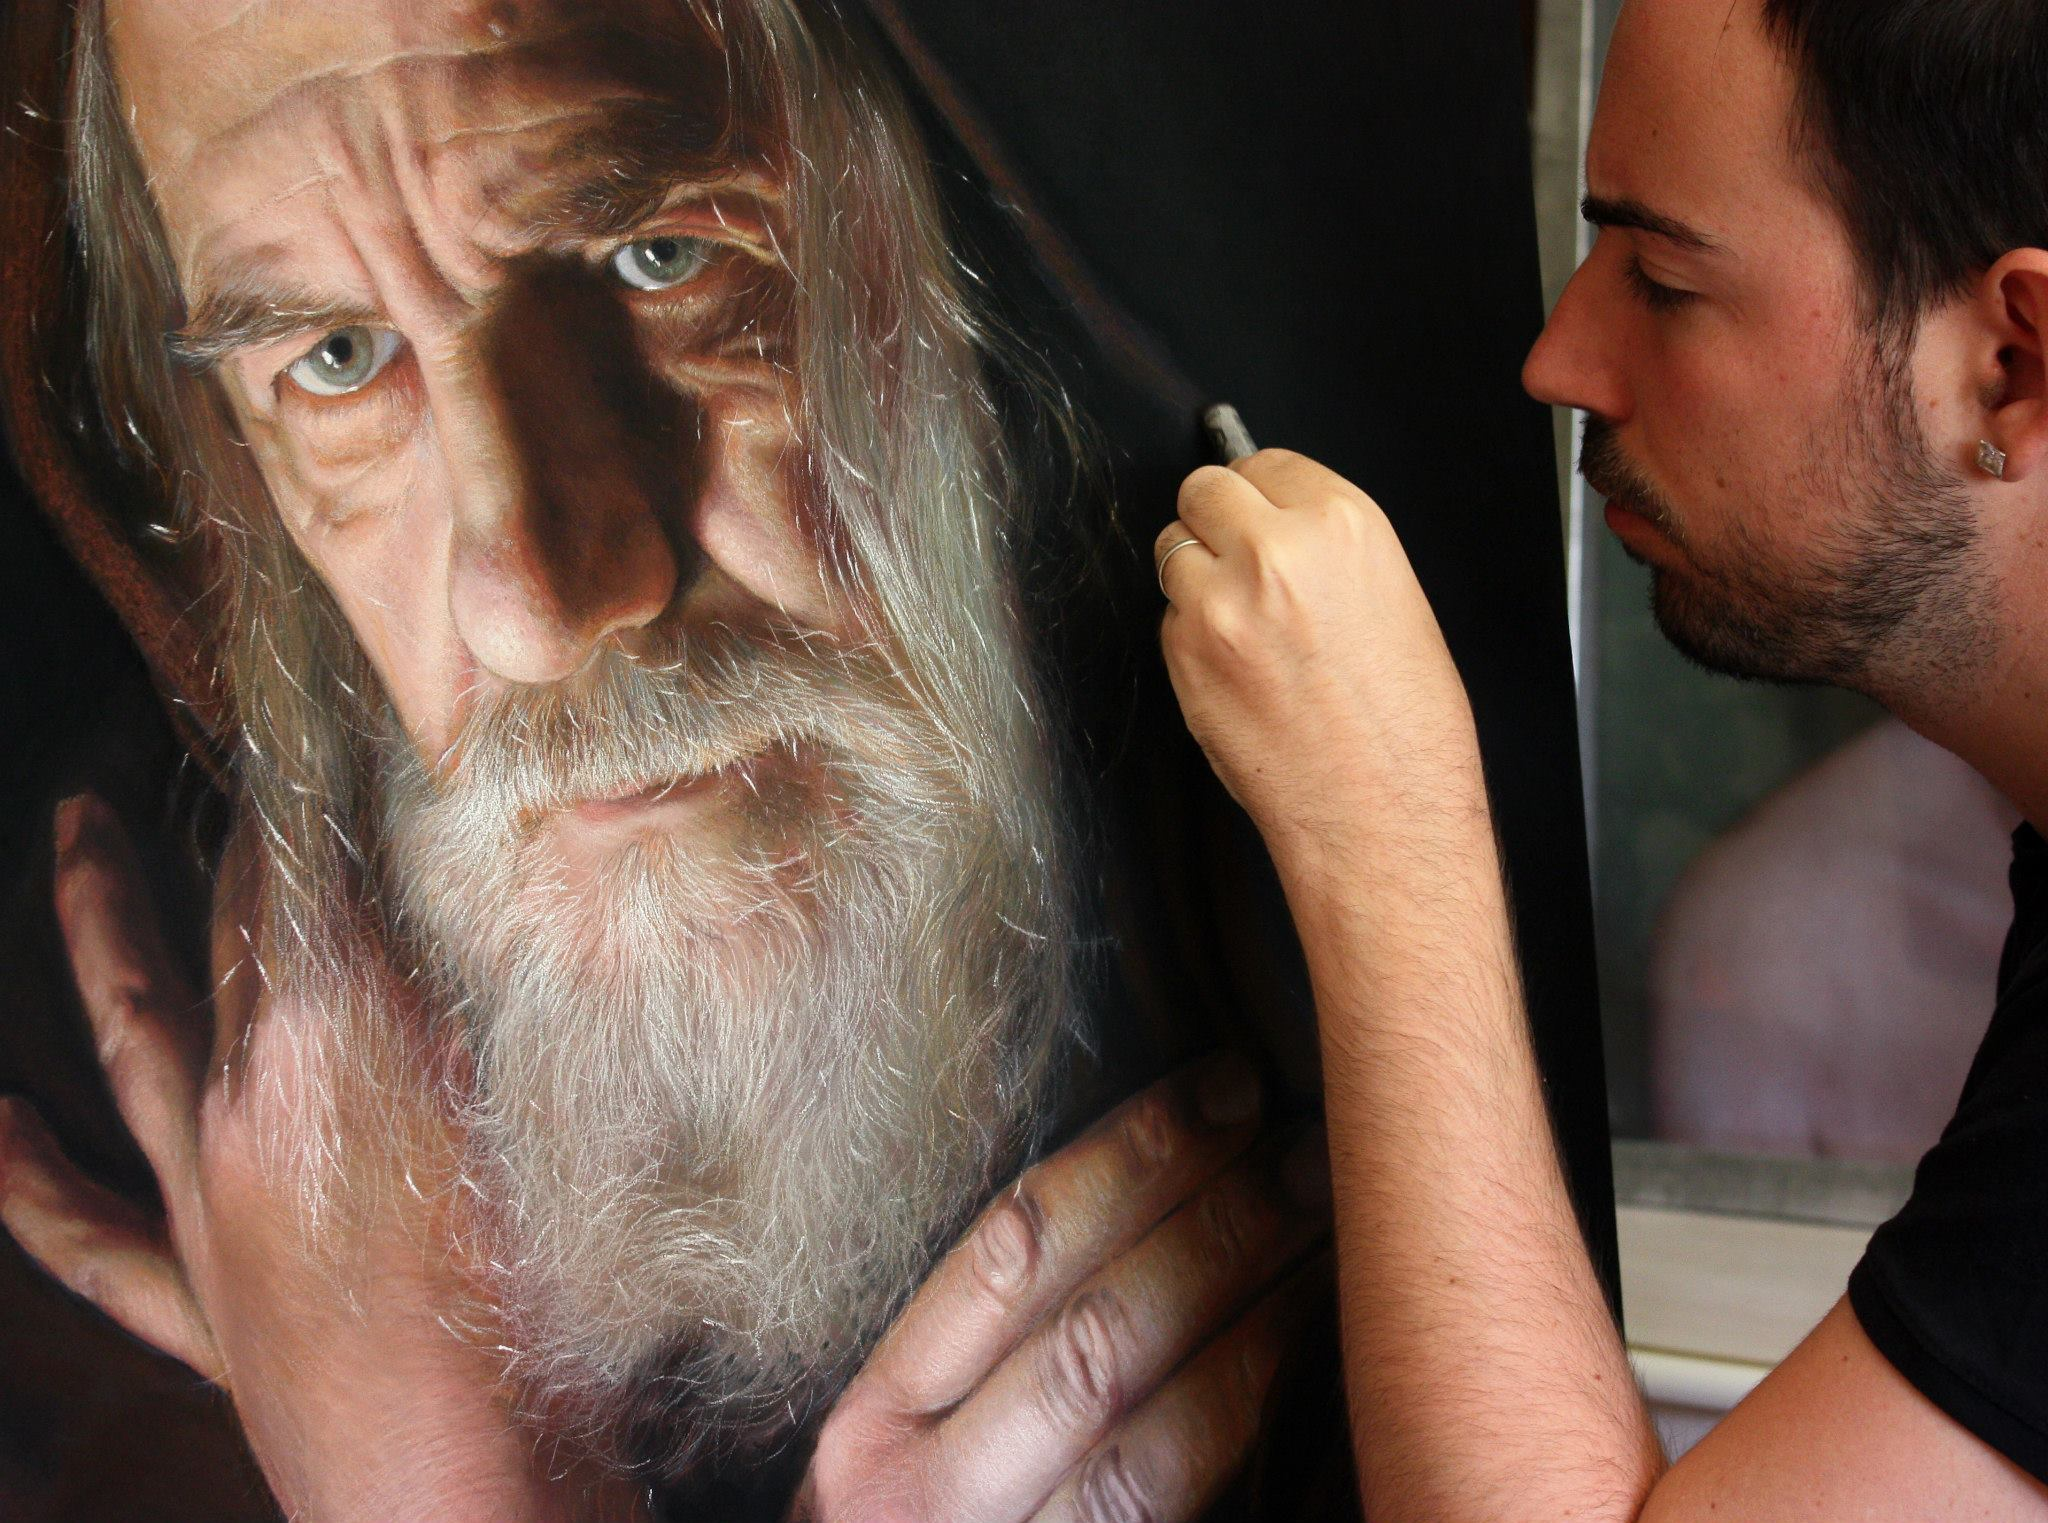 Ruben Belloso Adorna working on La Soledad del Genio (The solitude of the genius) Pastel on wood panel 100x70cm